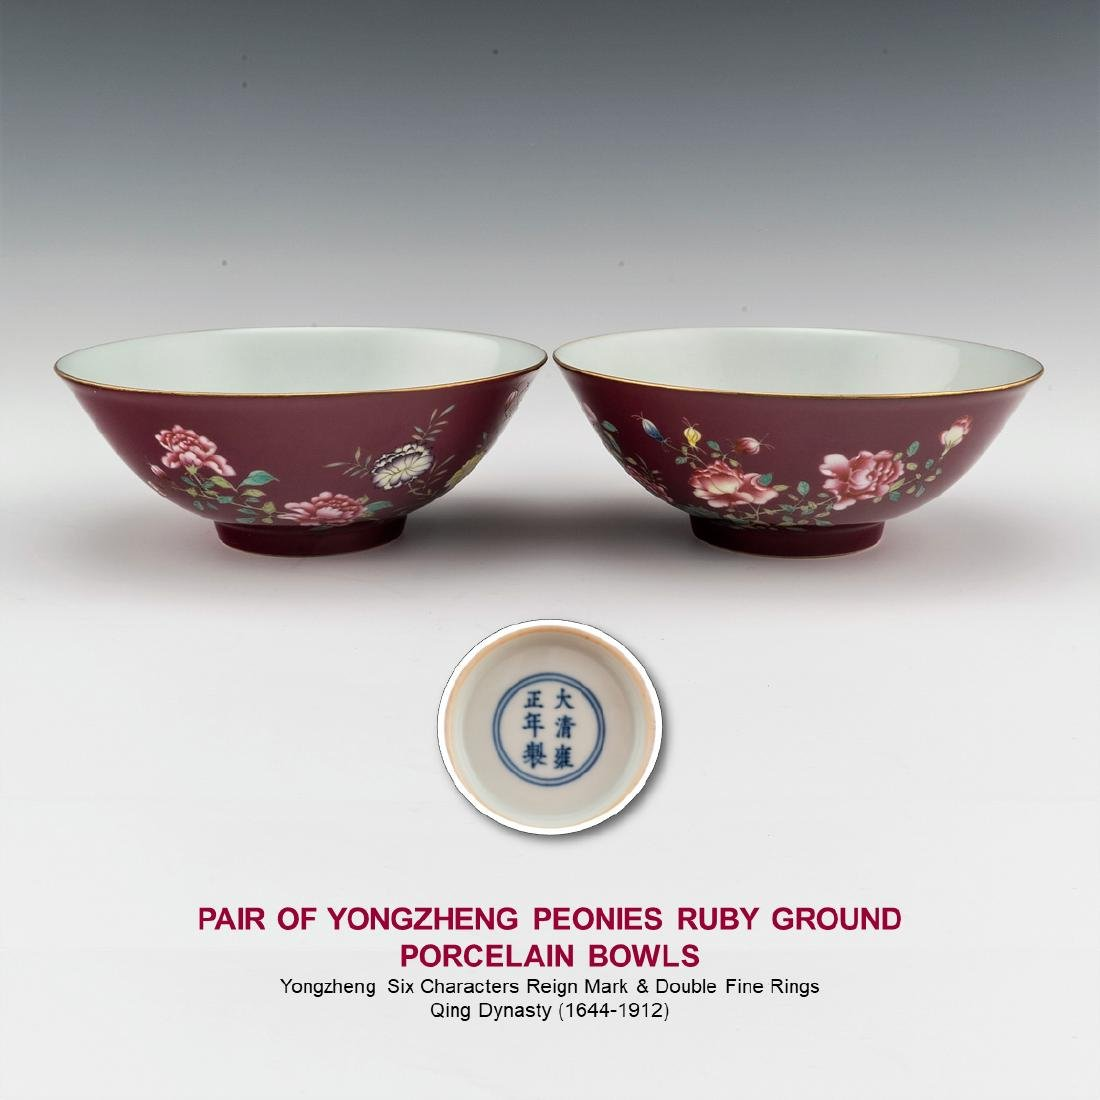 PAIR OF YONGZHENG PEONIES ON RUBY GROUND  BOWLS